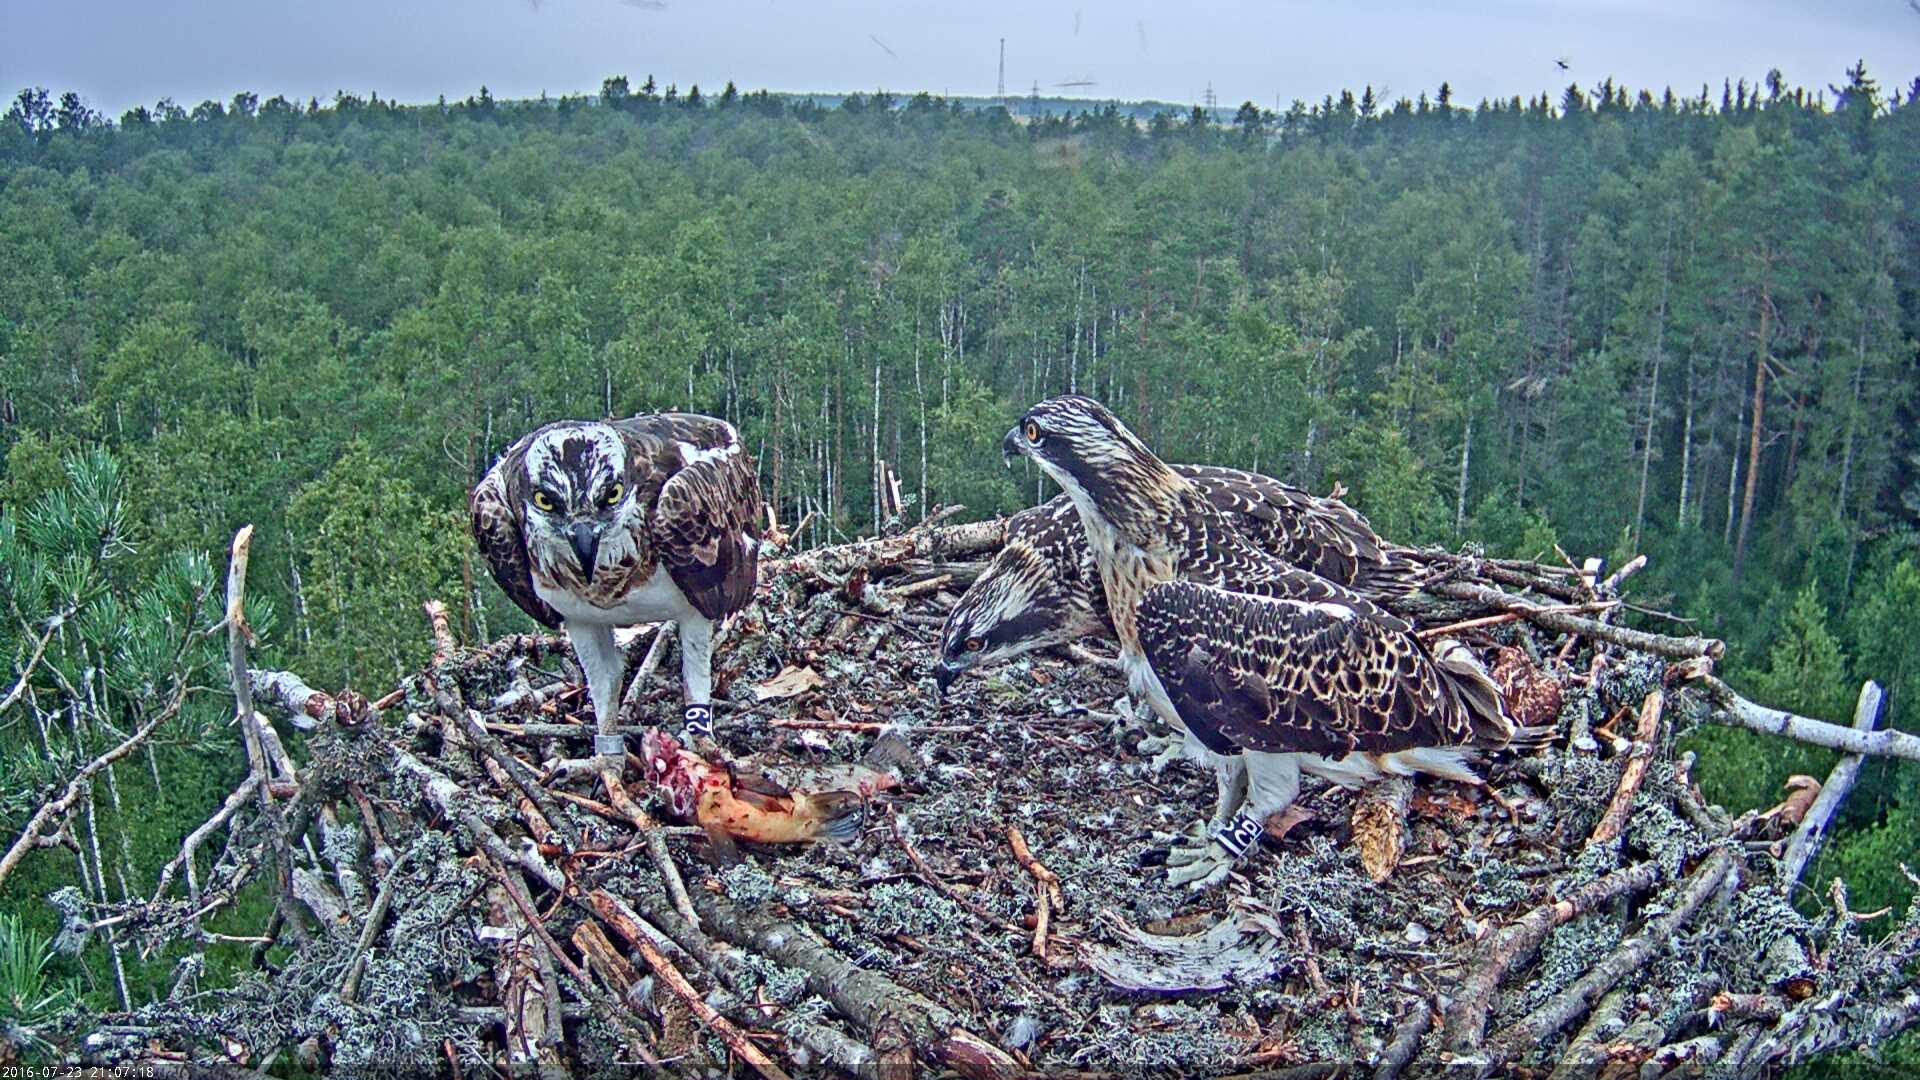 Estonian Osprey Nest Mai & Mati 2016 Kalakotkas-2016-07-23-21-07